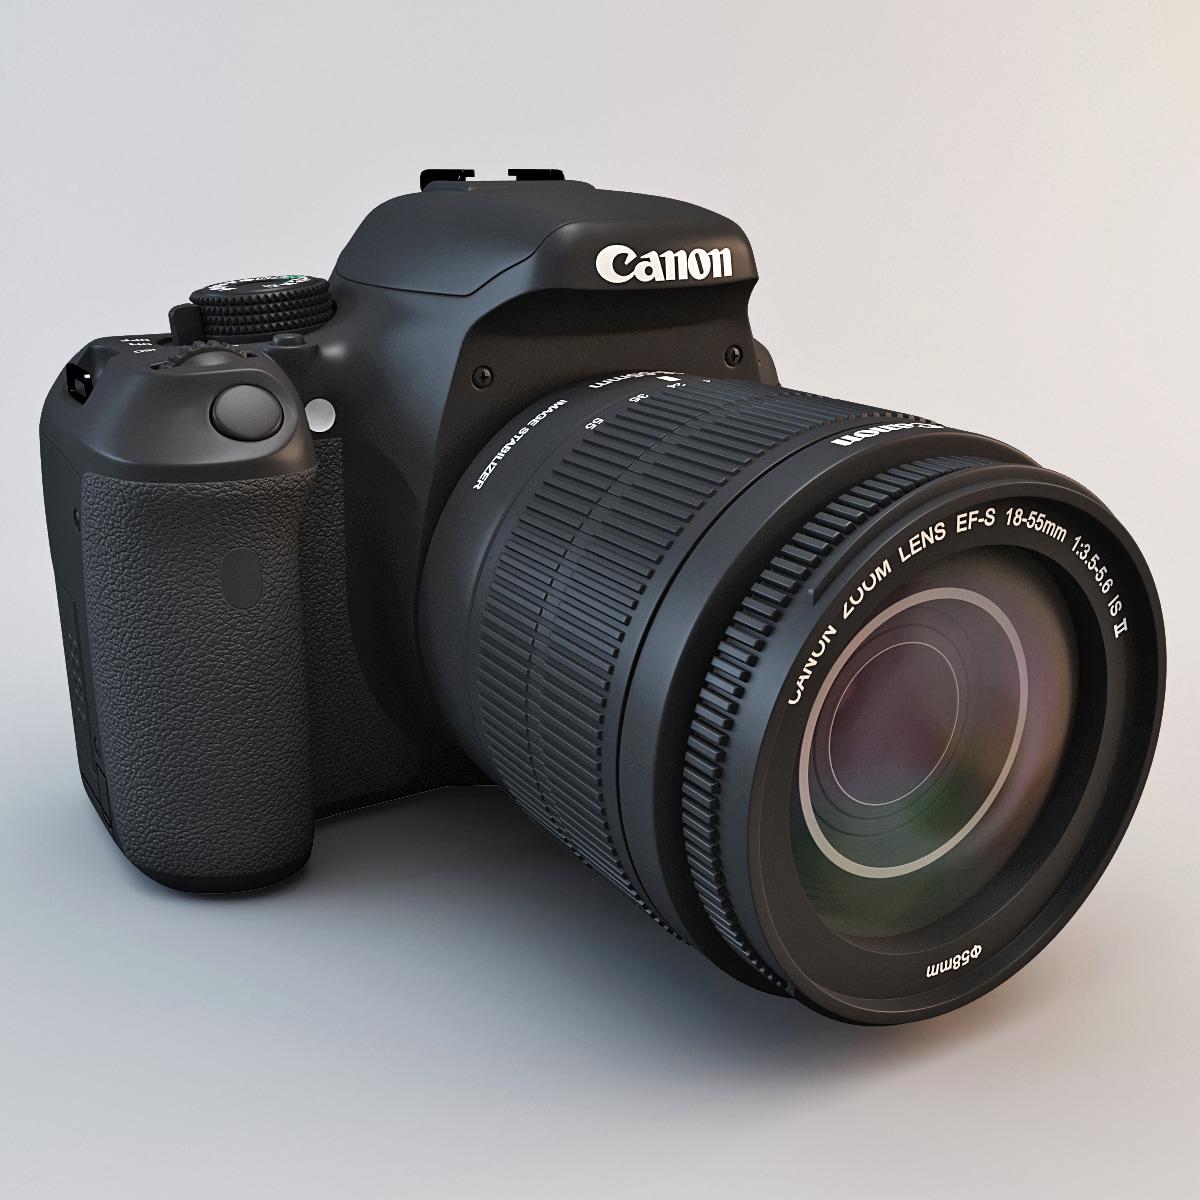 3d model of canon eos rebel t3i